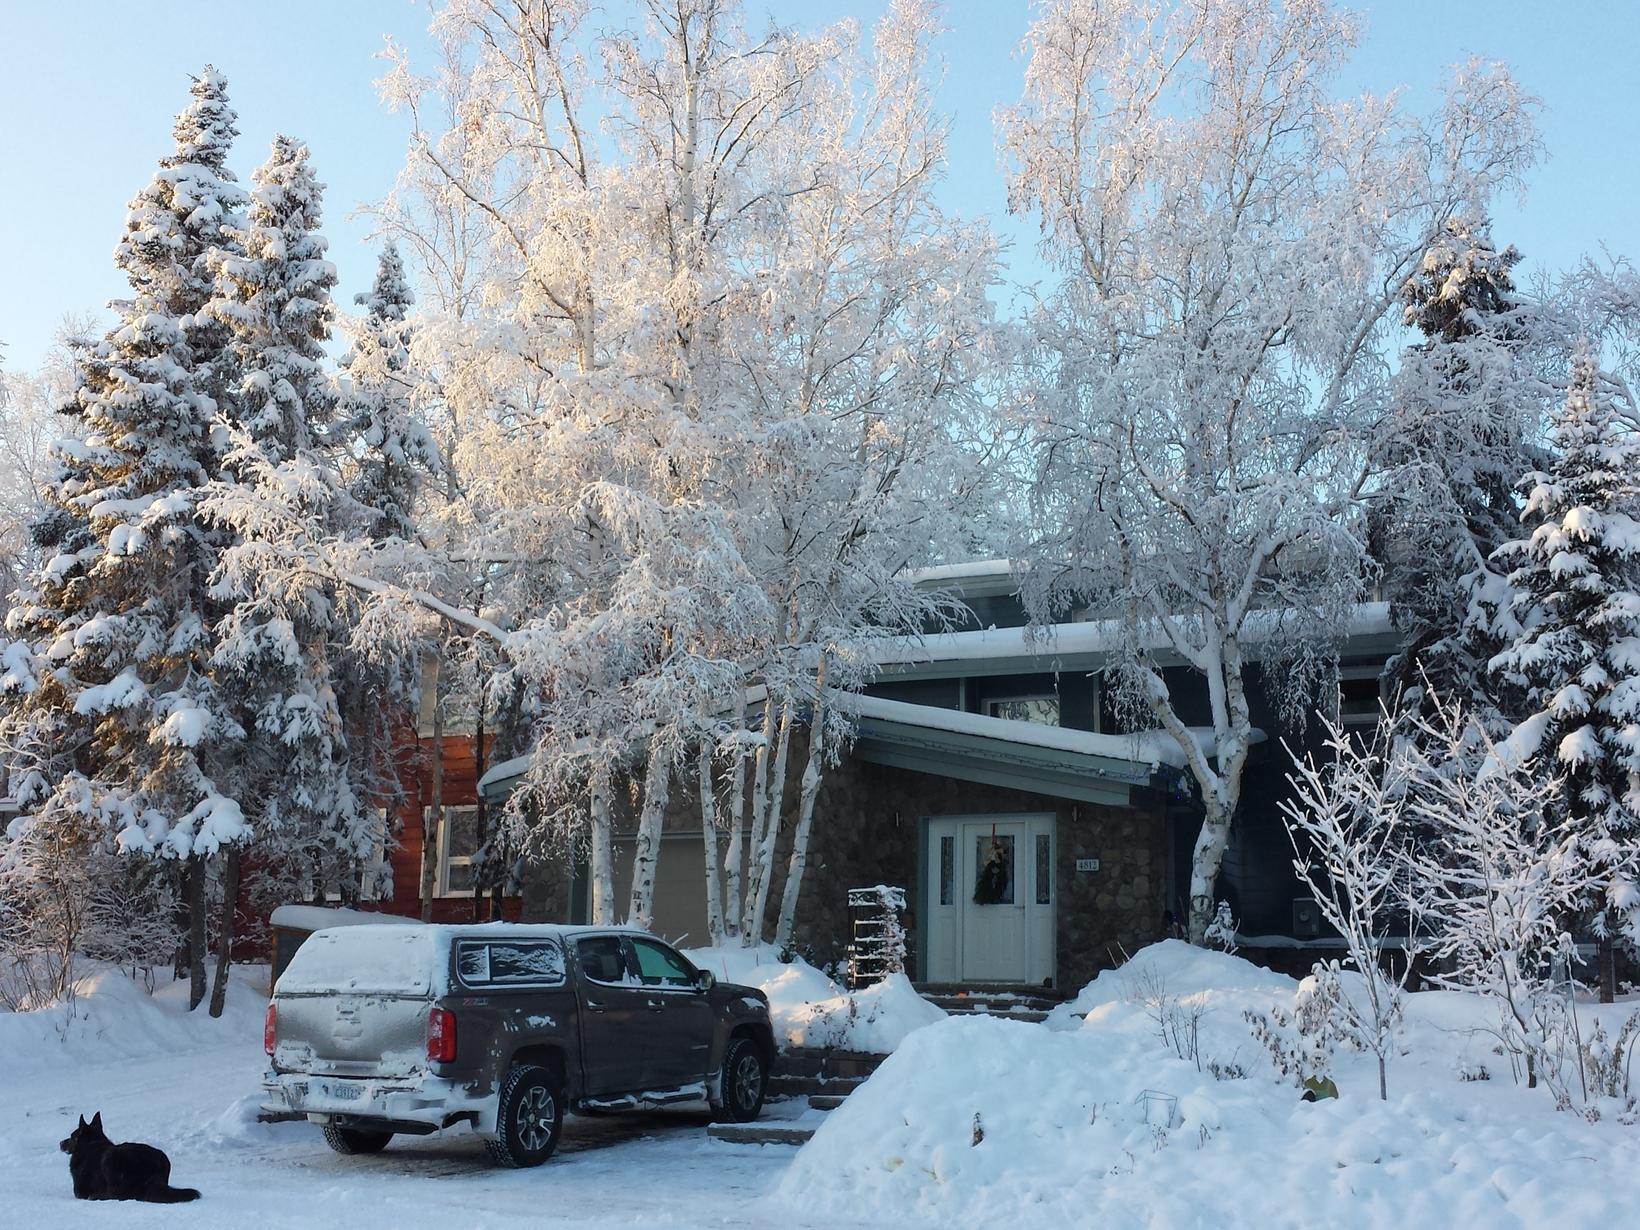 Yellowknife, Northwest Territory, Canada